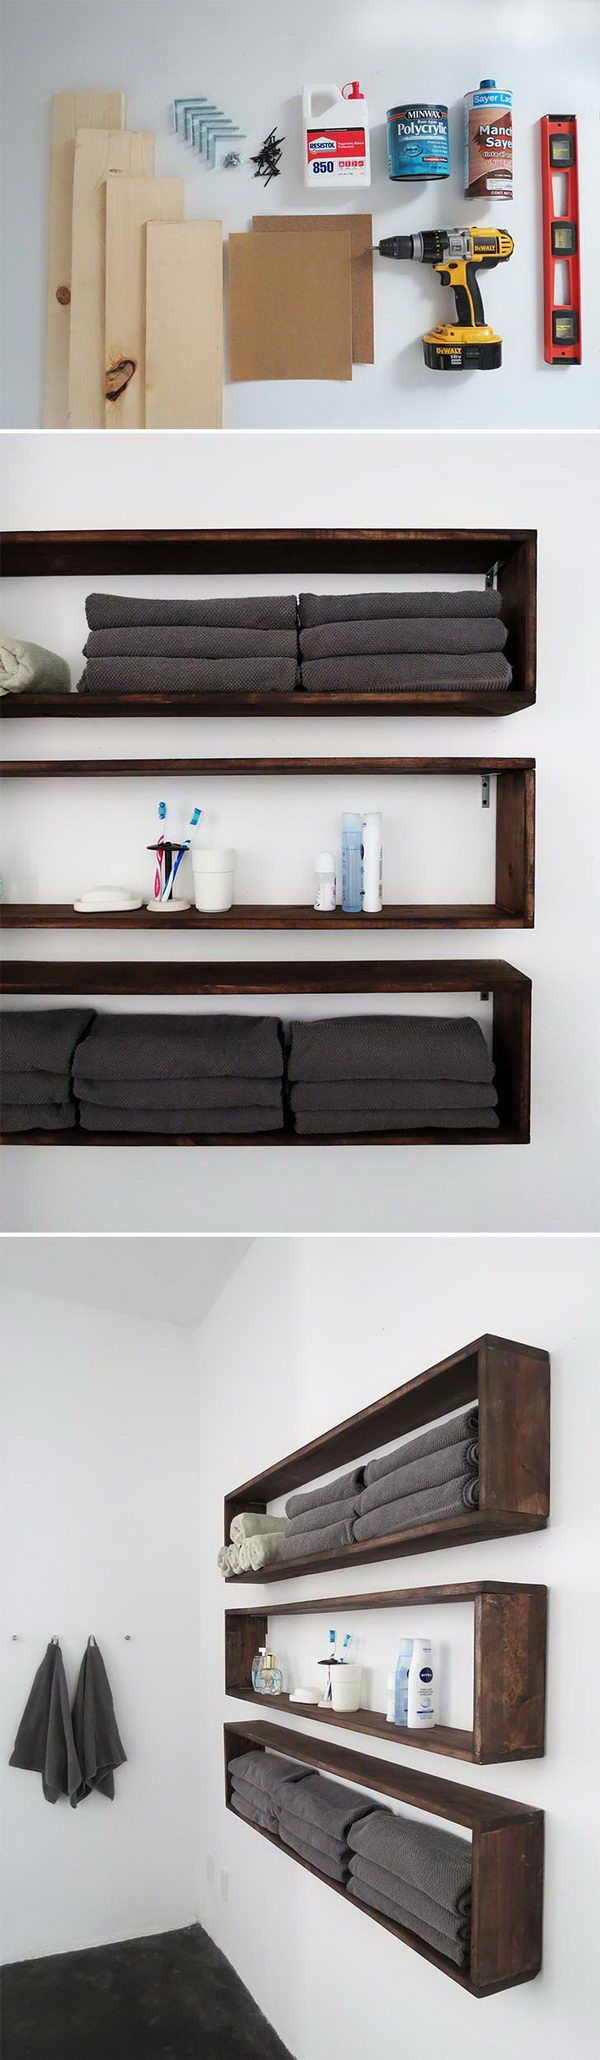 diy shelf ideas for bathroom%0A    Cool DIY Home Decor Ideas